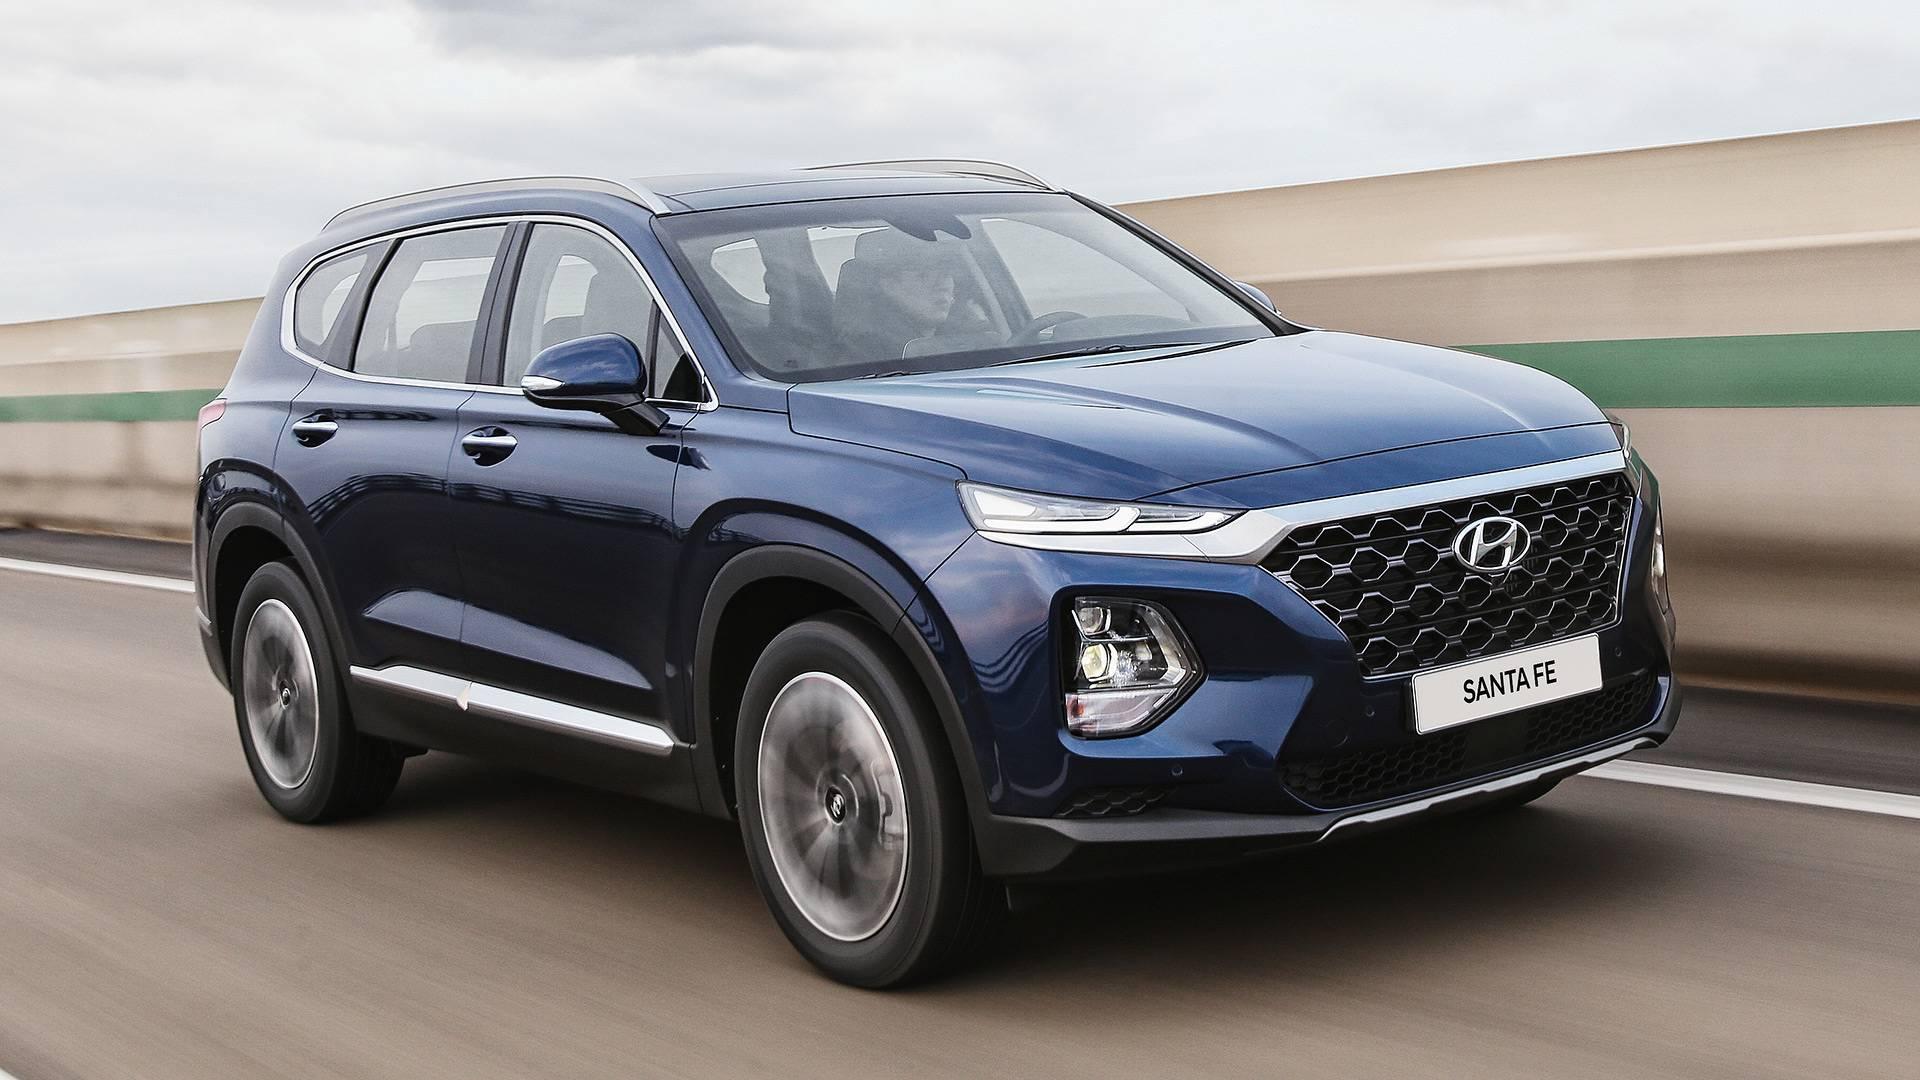 2019 Hyundai Santa Fe First Drive Reshaped Resized Revitalized